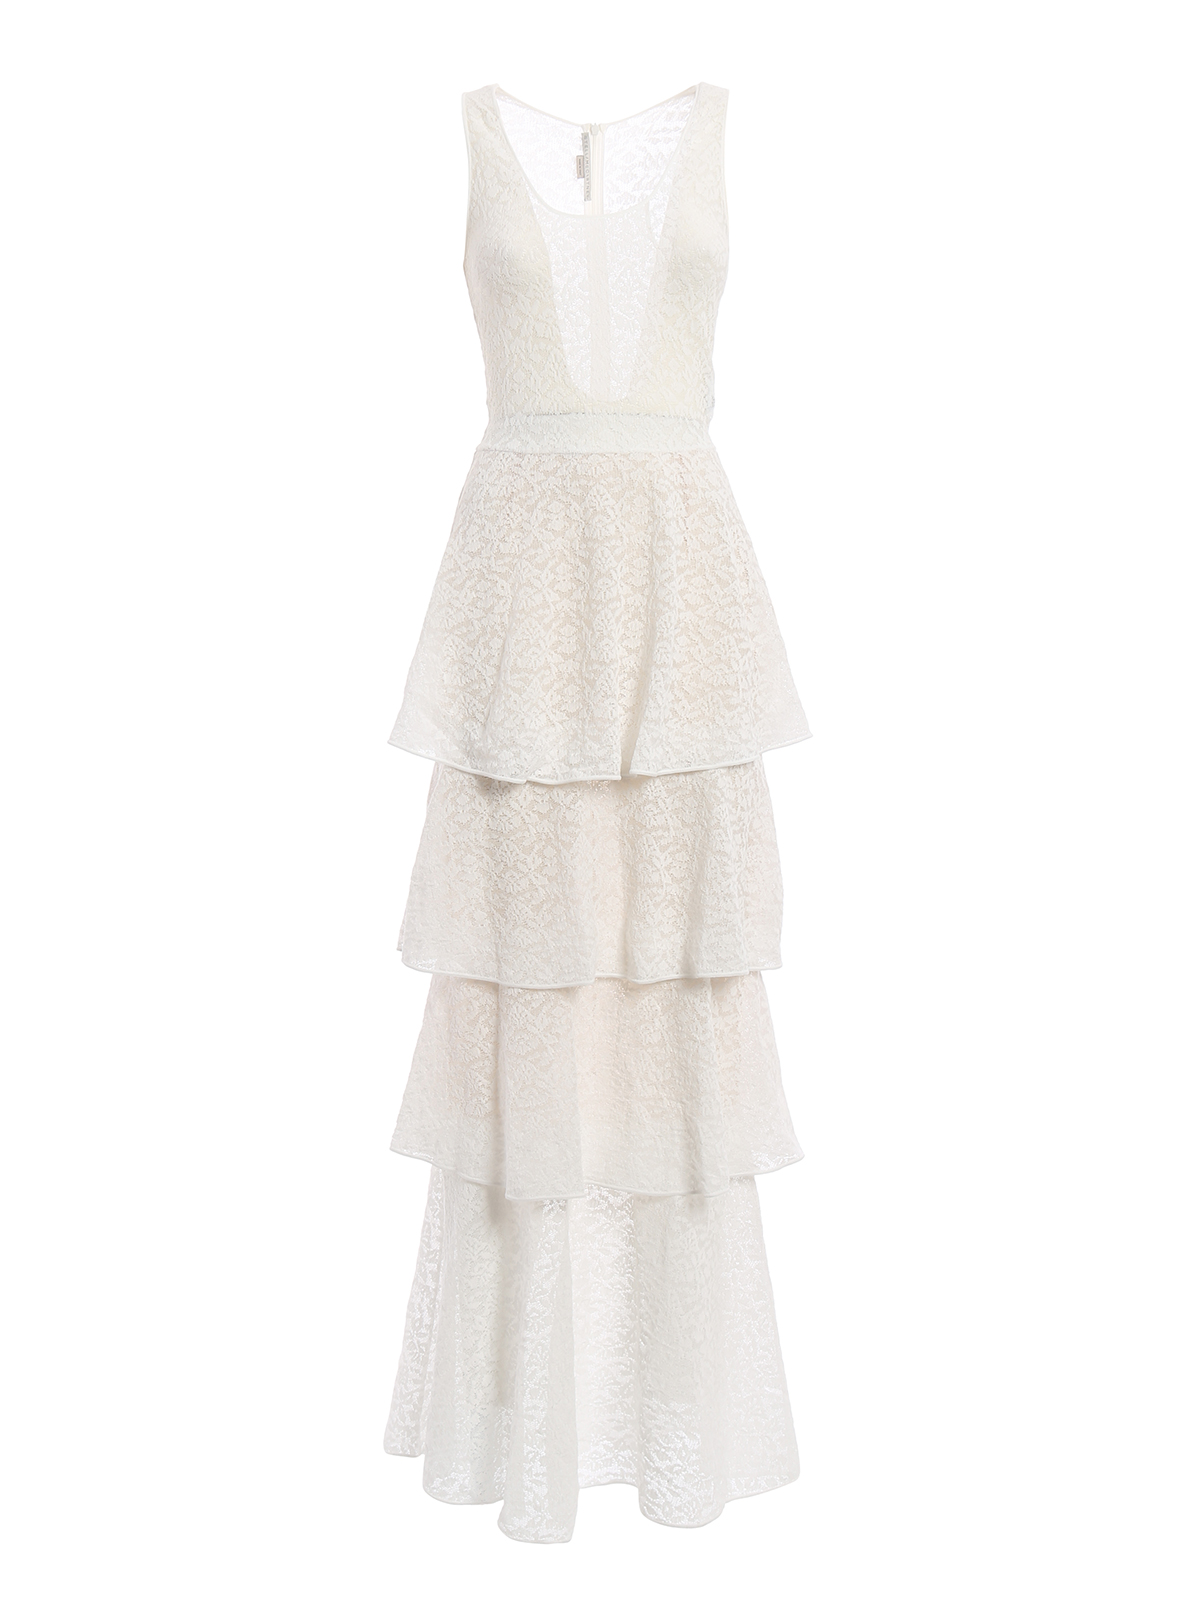 Stella Mccartney Layered Skirt Lace Evening Dress Evening